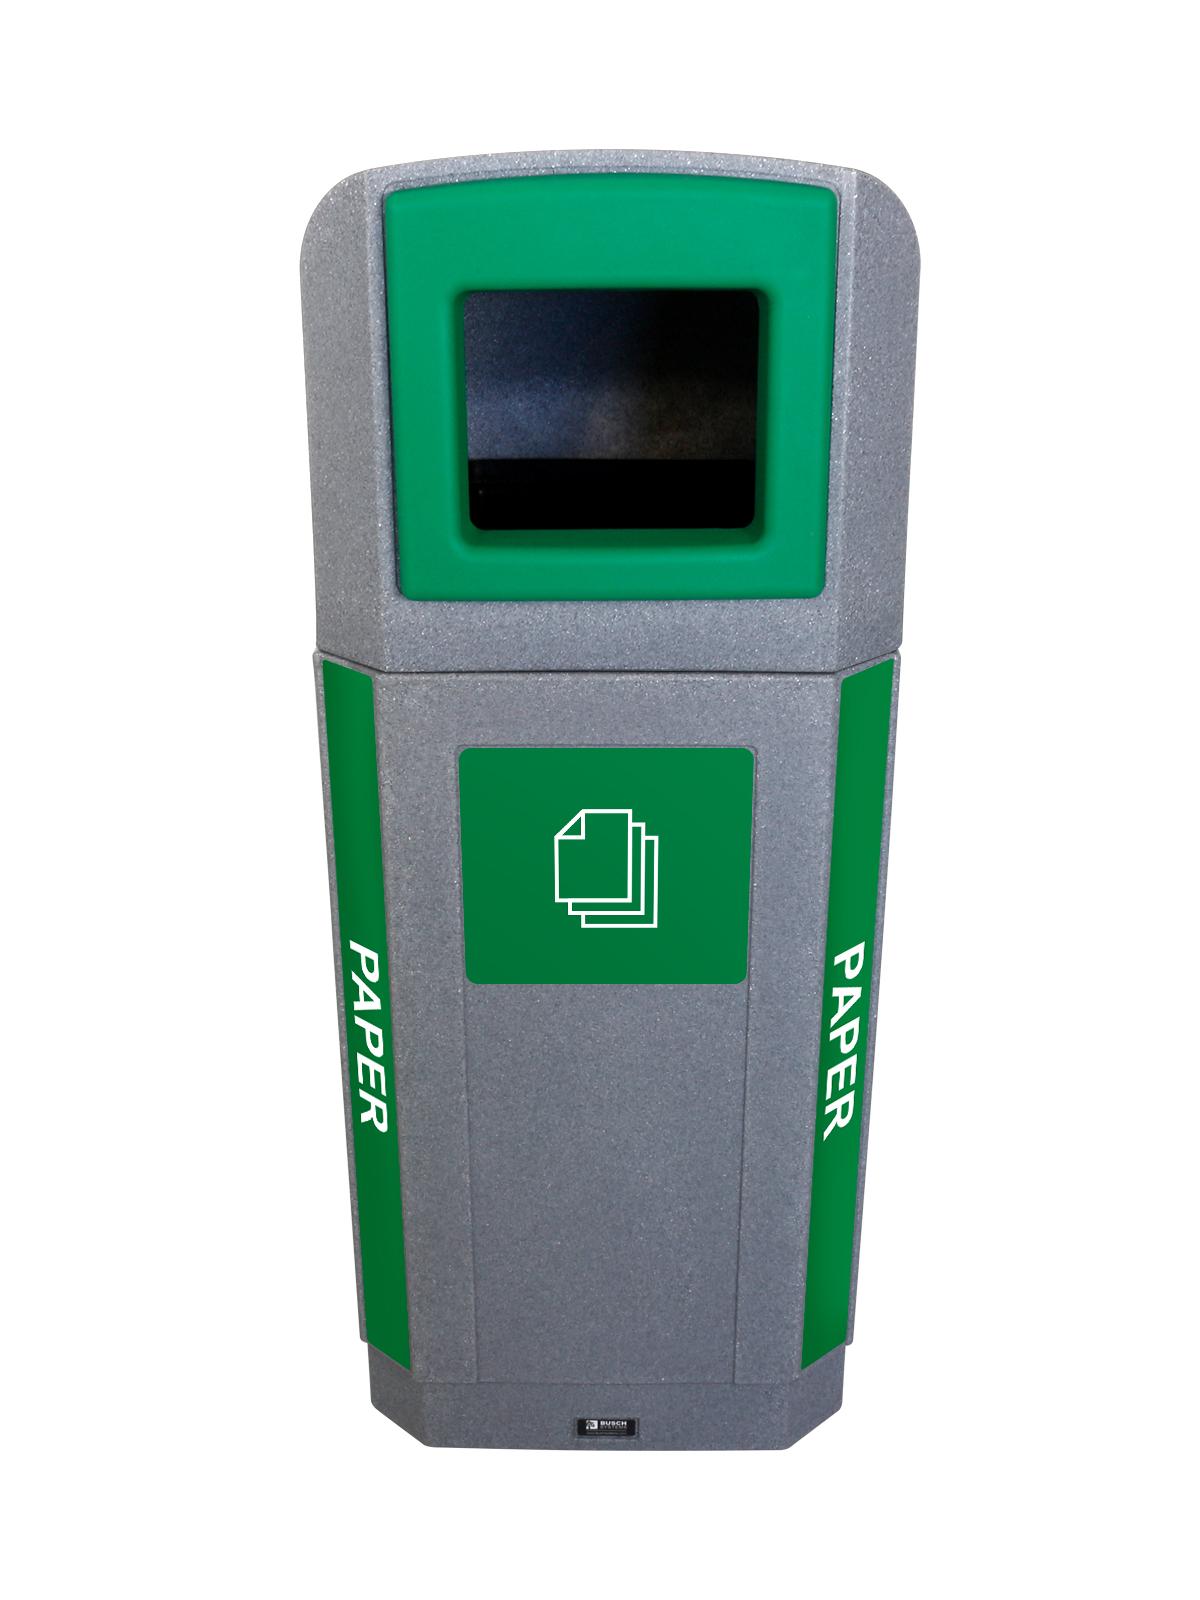 OCTO - Single - Outdoor - Paper - Full - Greystone-Green